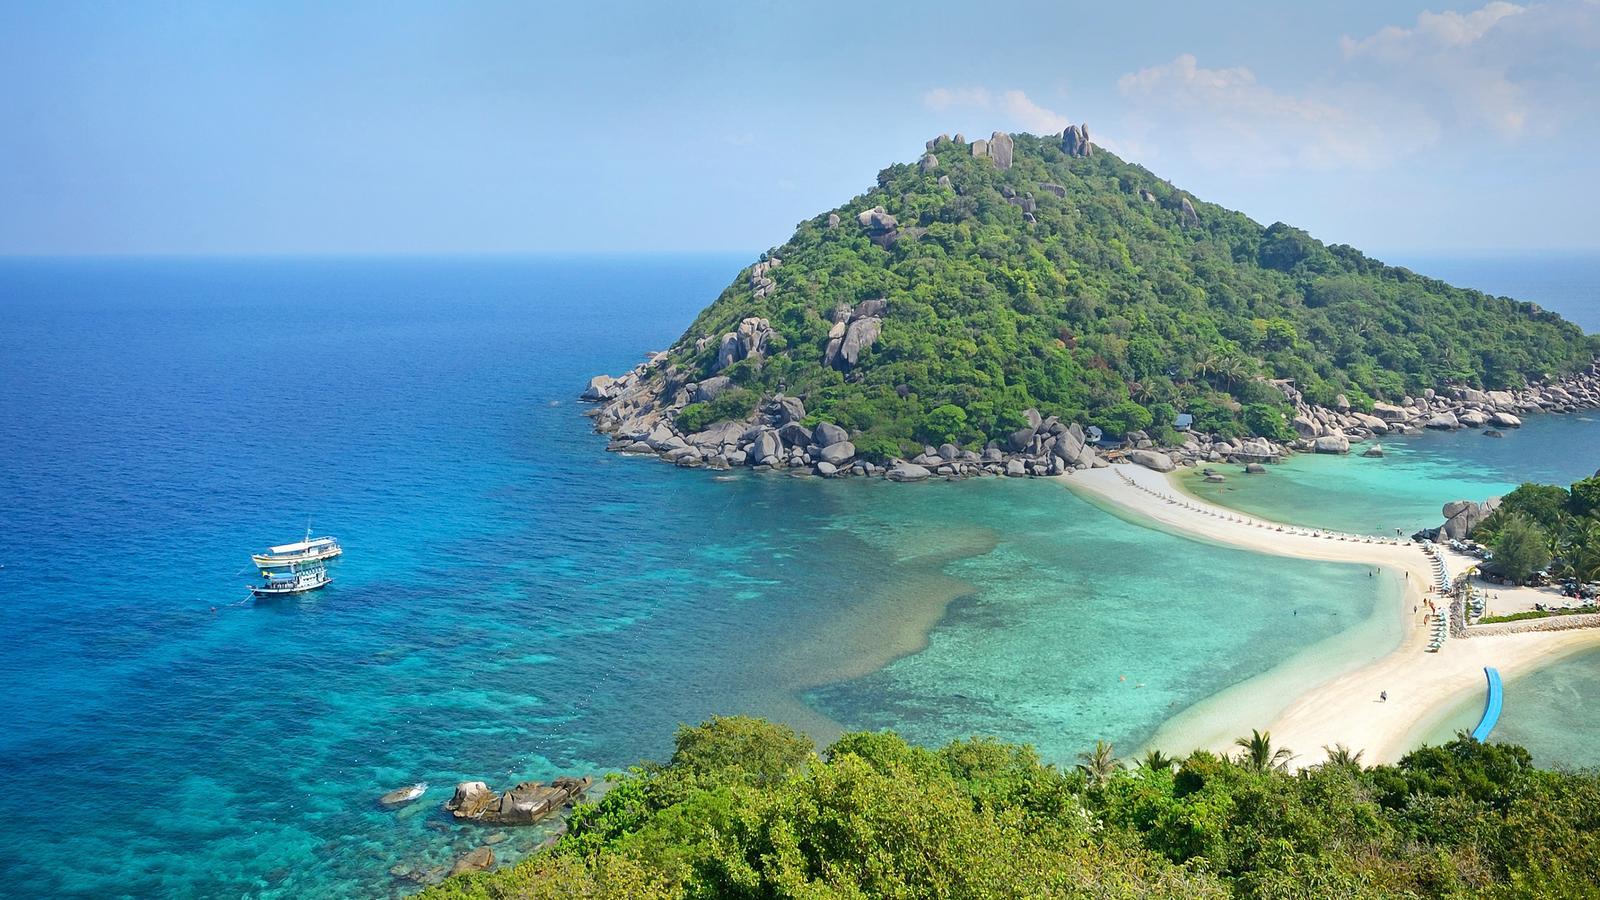 WCfIddD3RJ0 - Открытие Таиланда